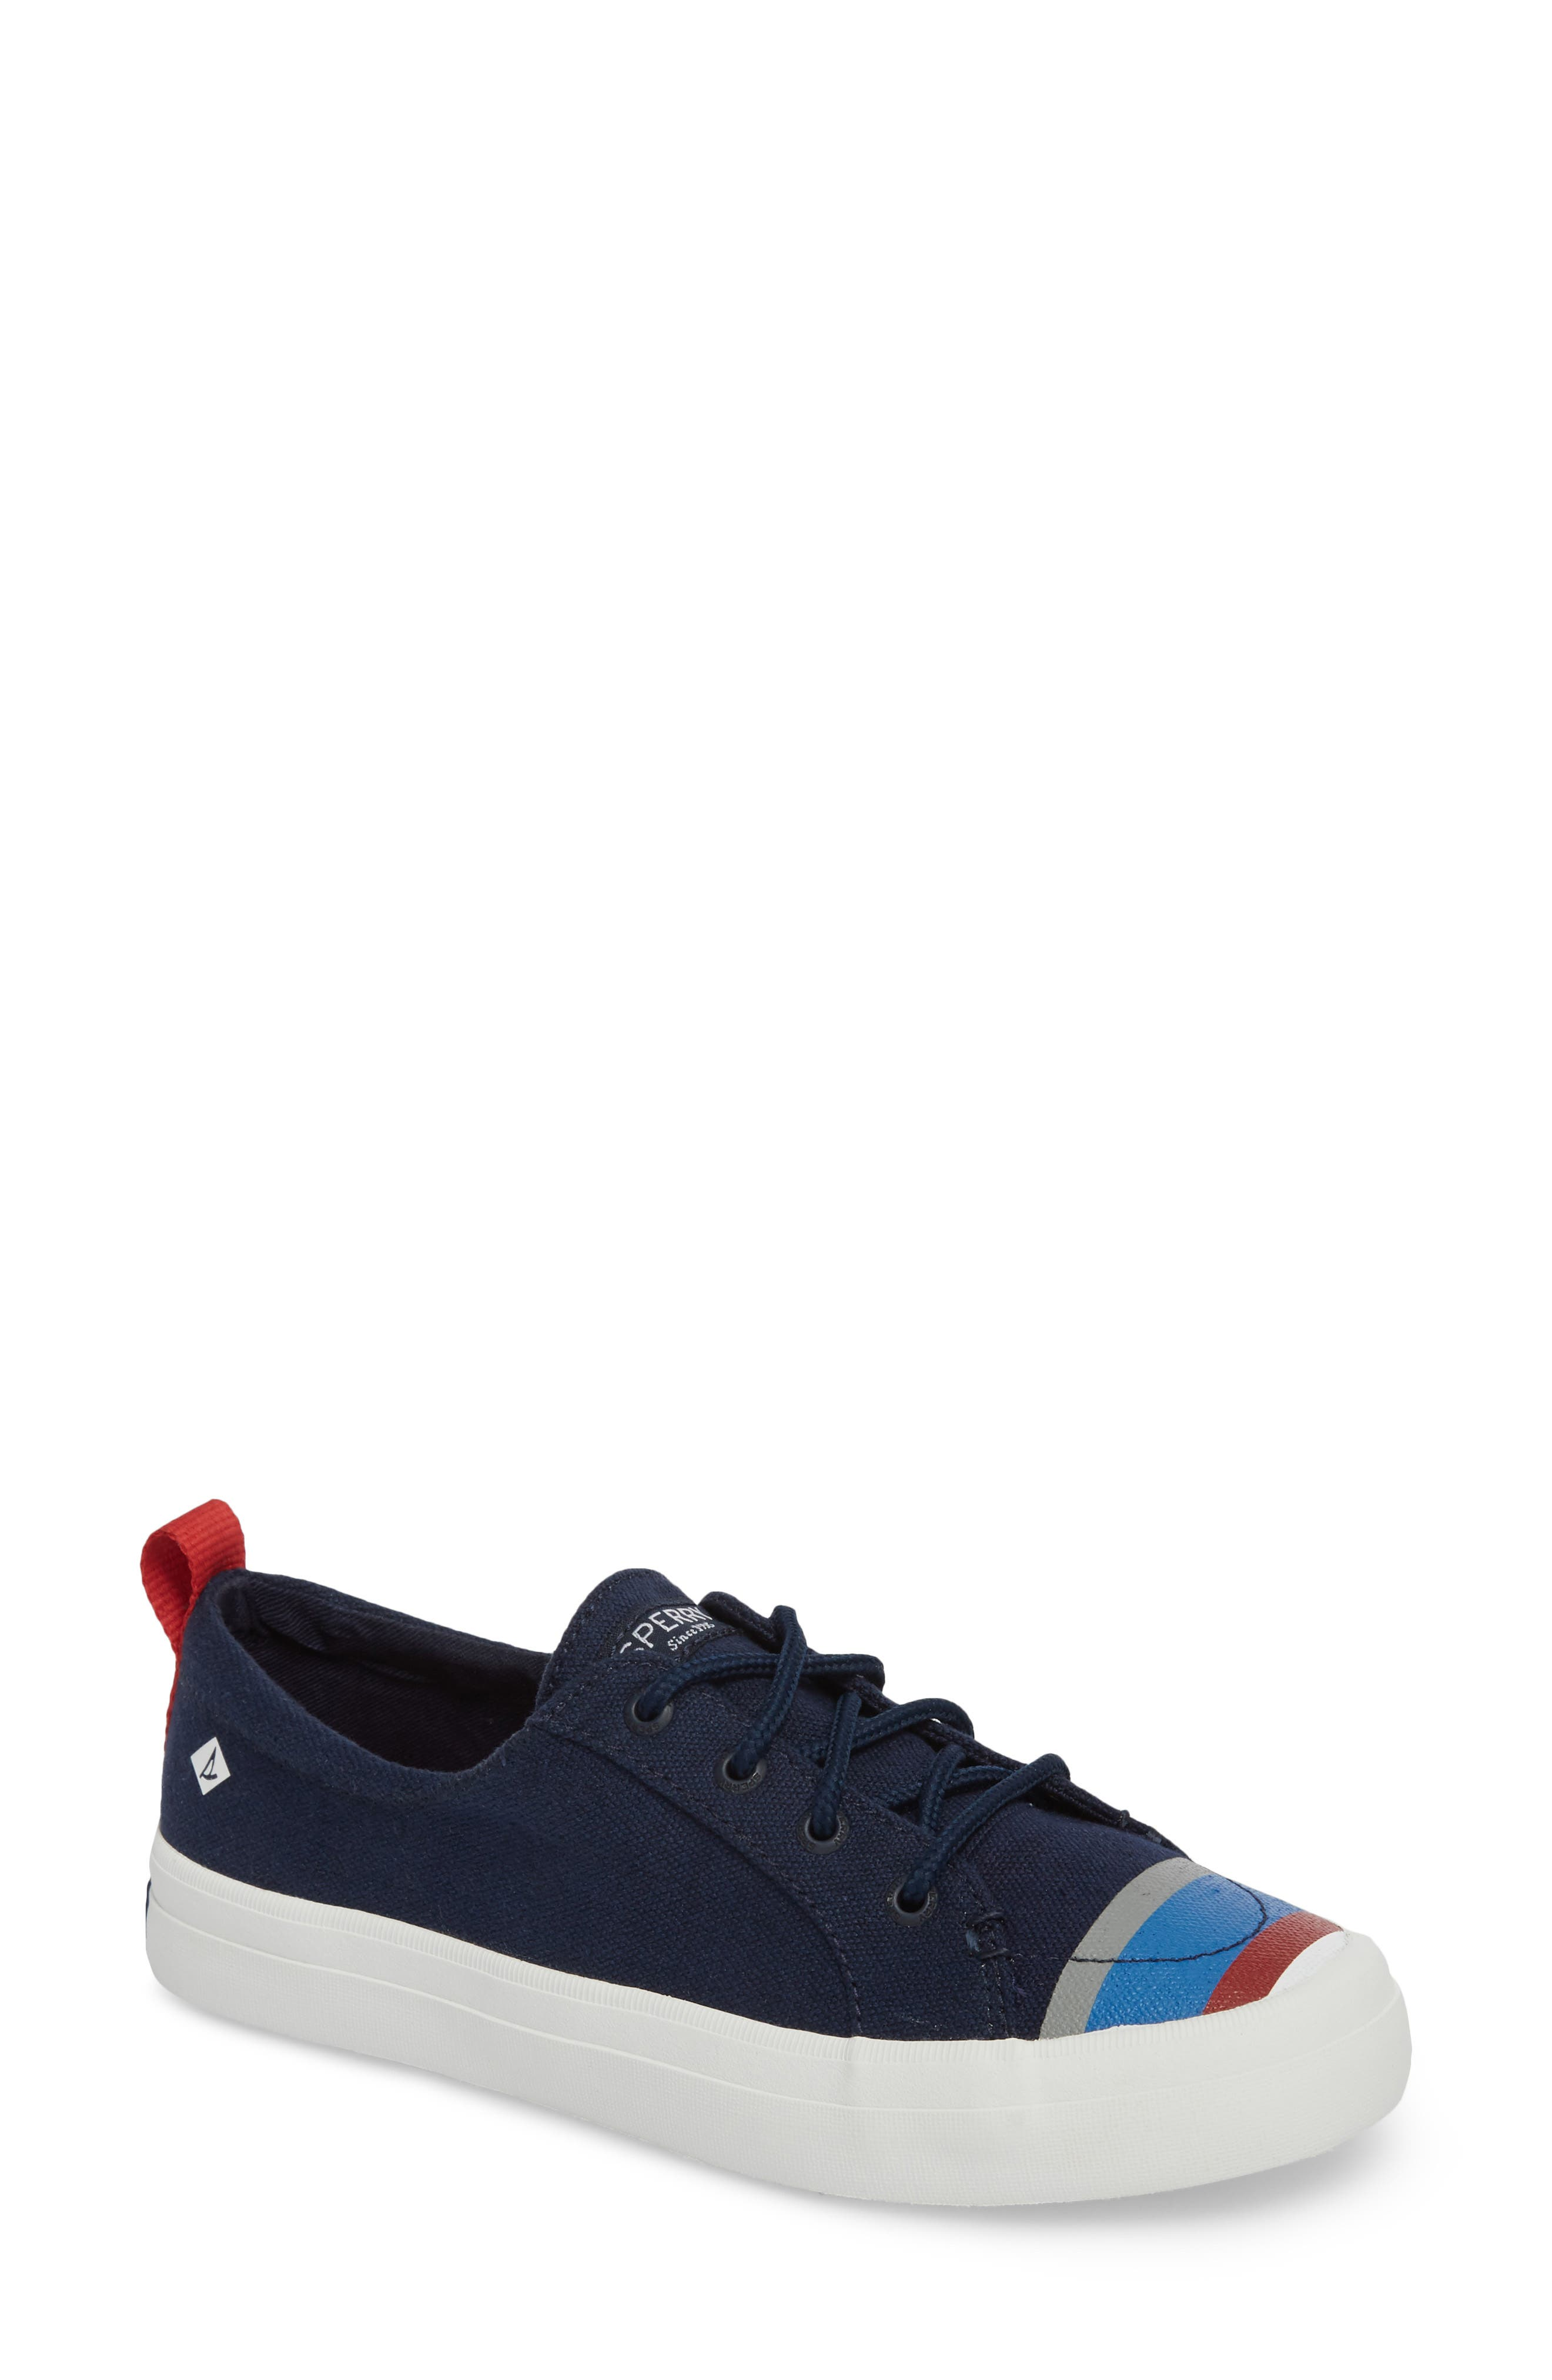 Crest Vibe Slip-On Sneaker,                             Main thumbnail 1, color,                             Navy Buoy Stripe Canvas